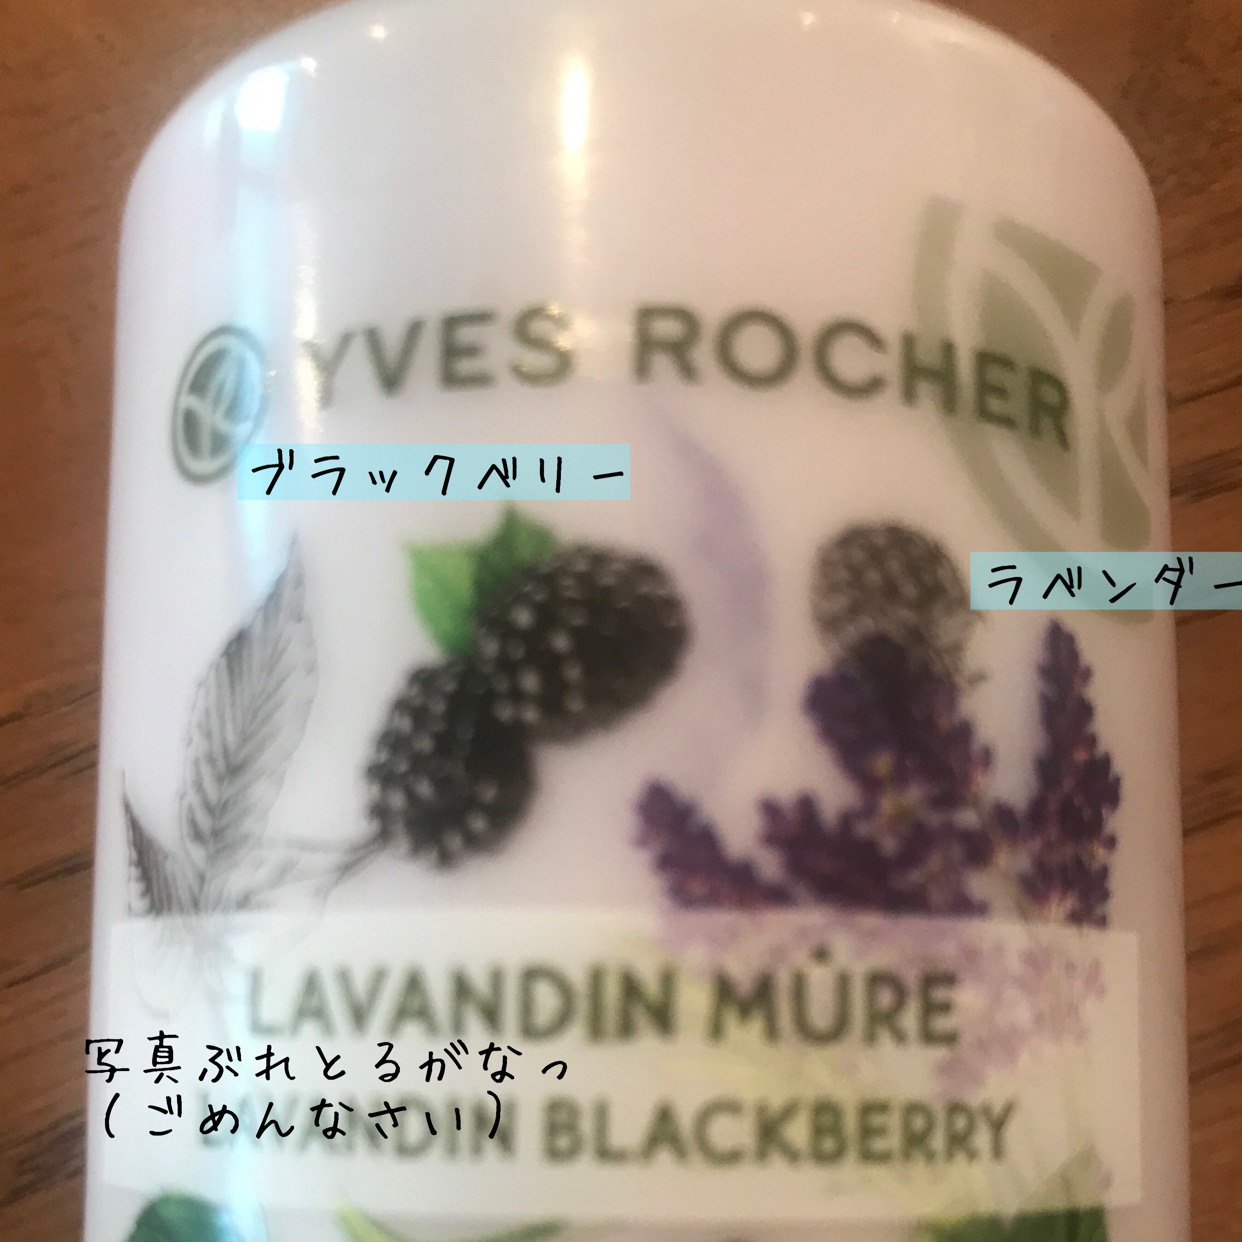 YVES ROCHER ボディローション ラベンダー&ブラックベリー(ボディローション・ミルク)を使ったクチコミ(3枚目)